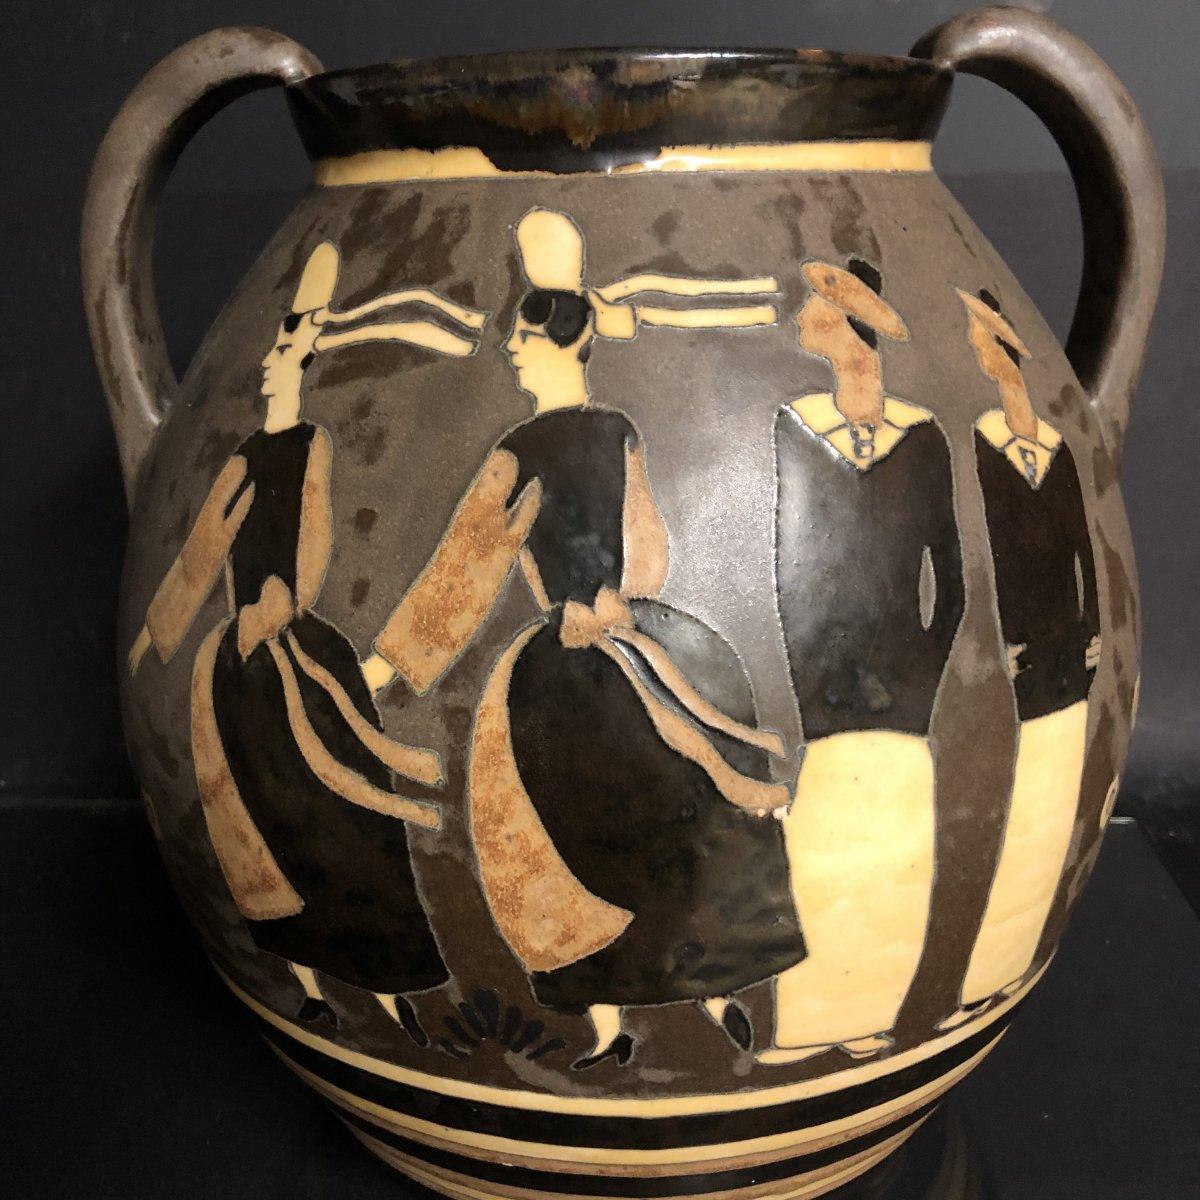 Jules Henriot Odetta Quimper Important Marines And Bigoudenes Vase, Double Sided Tbe Art Deco 1016